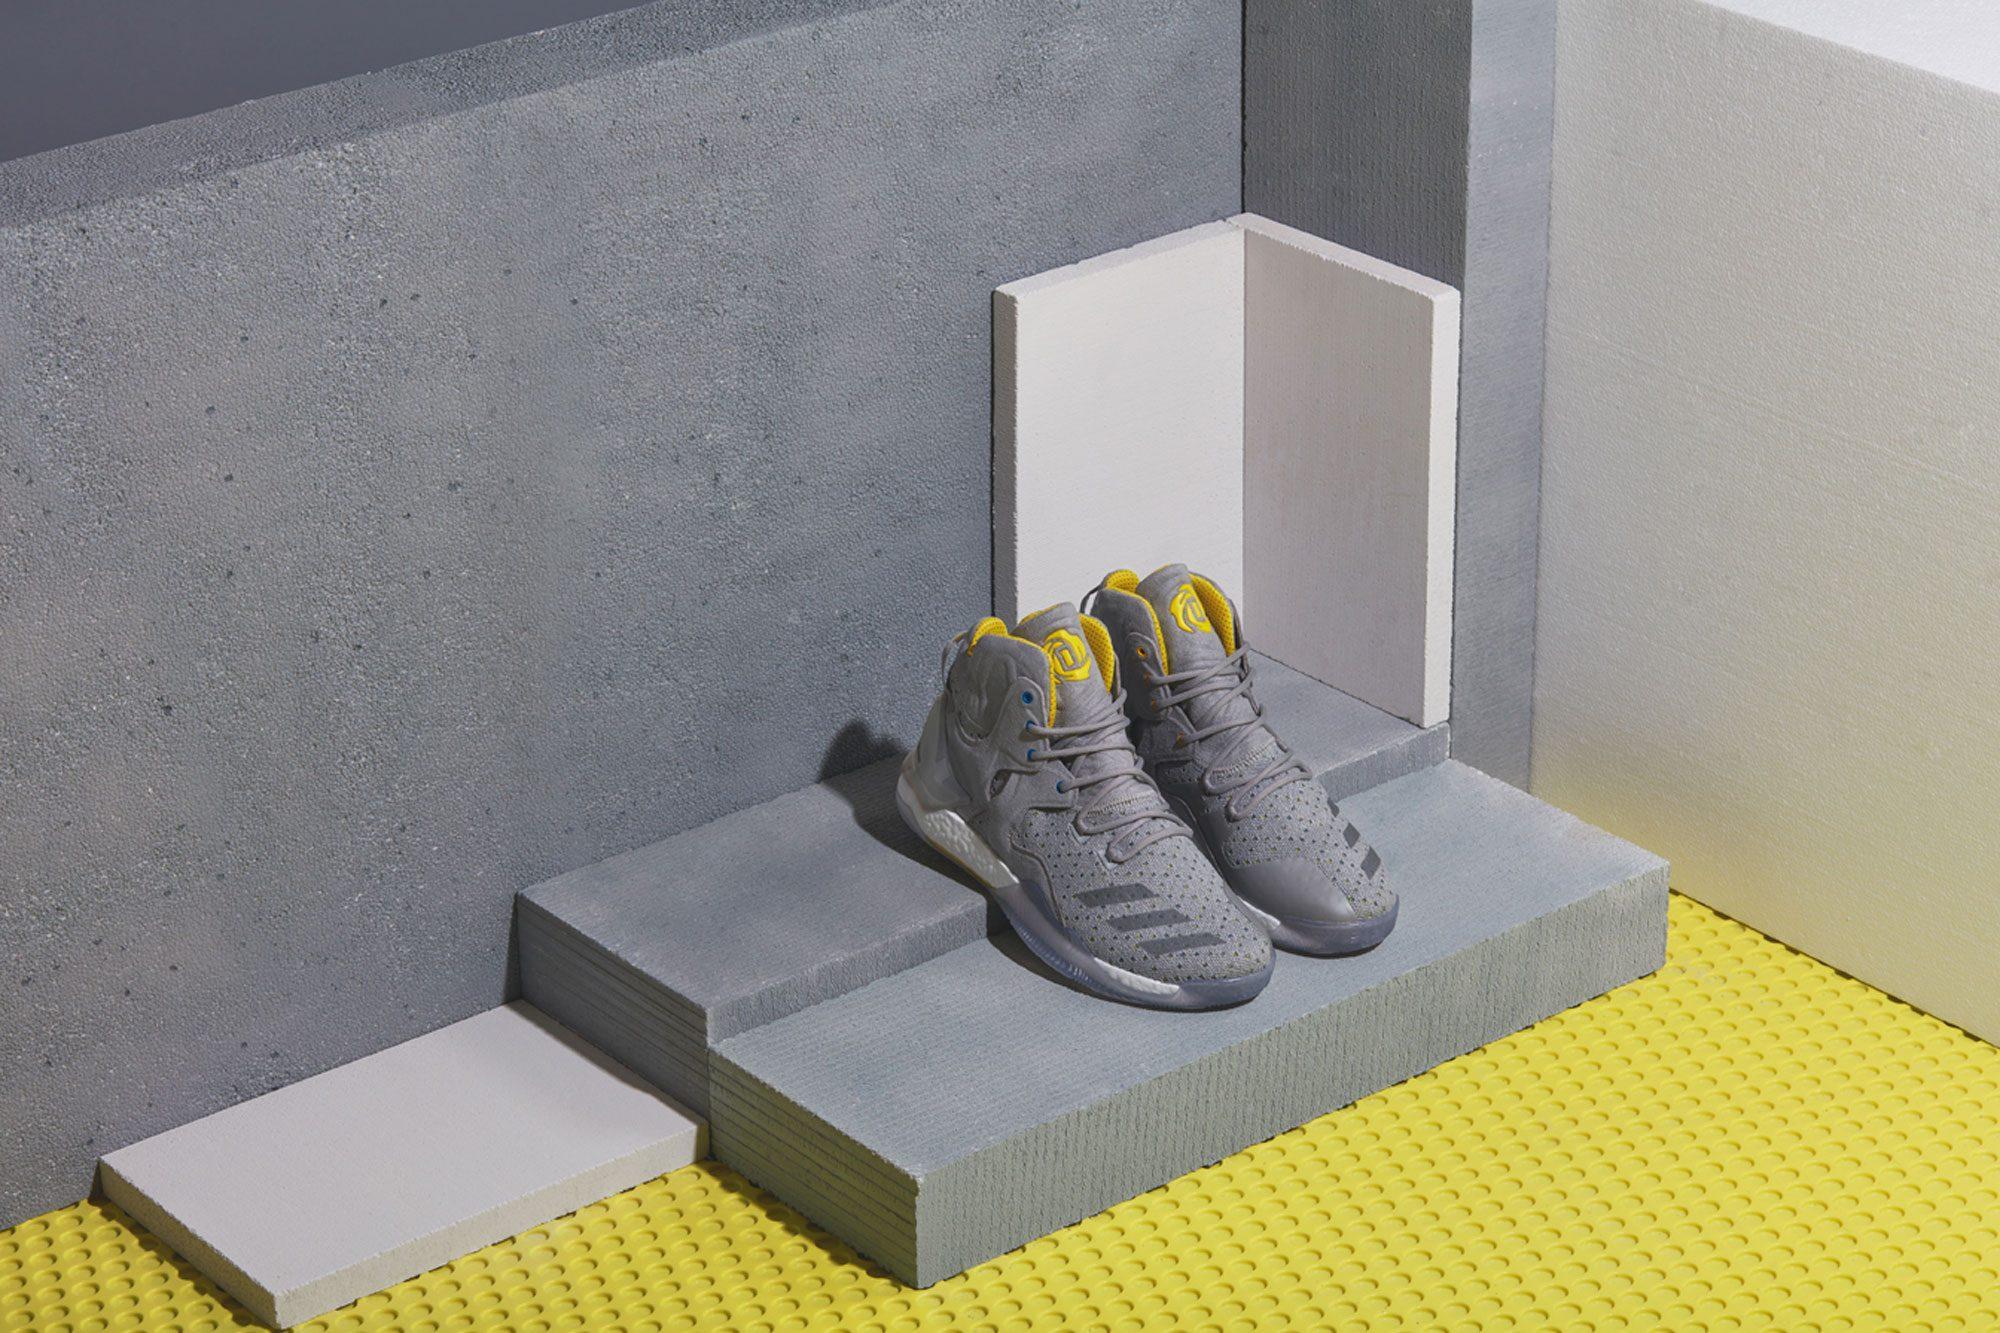 adidas-consortium-sns-d-rose-7-pk-3